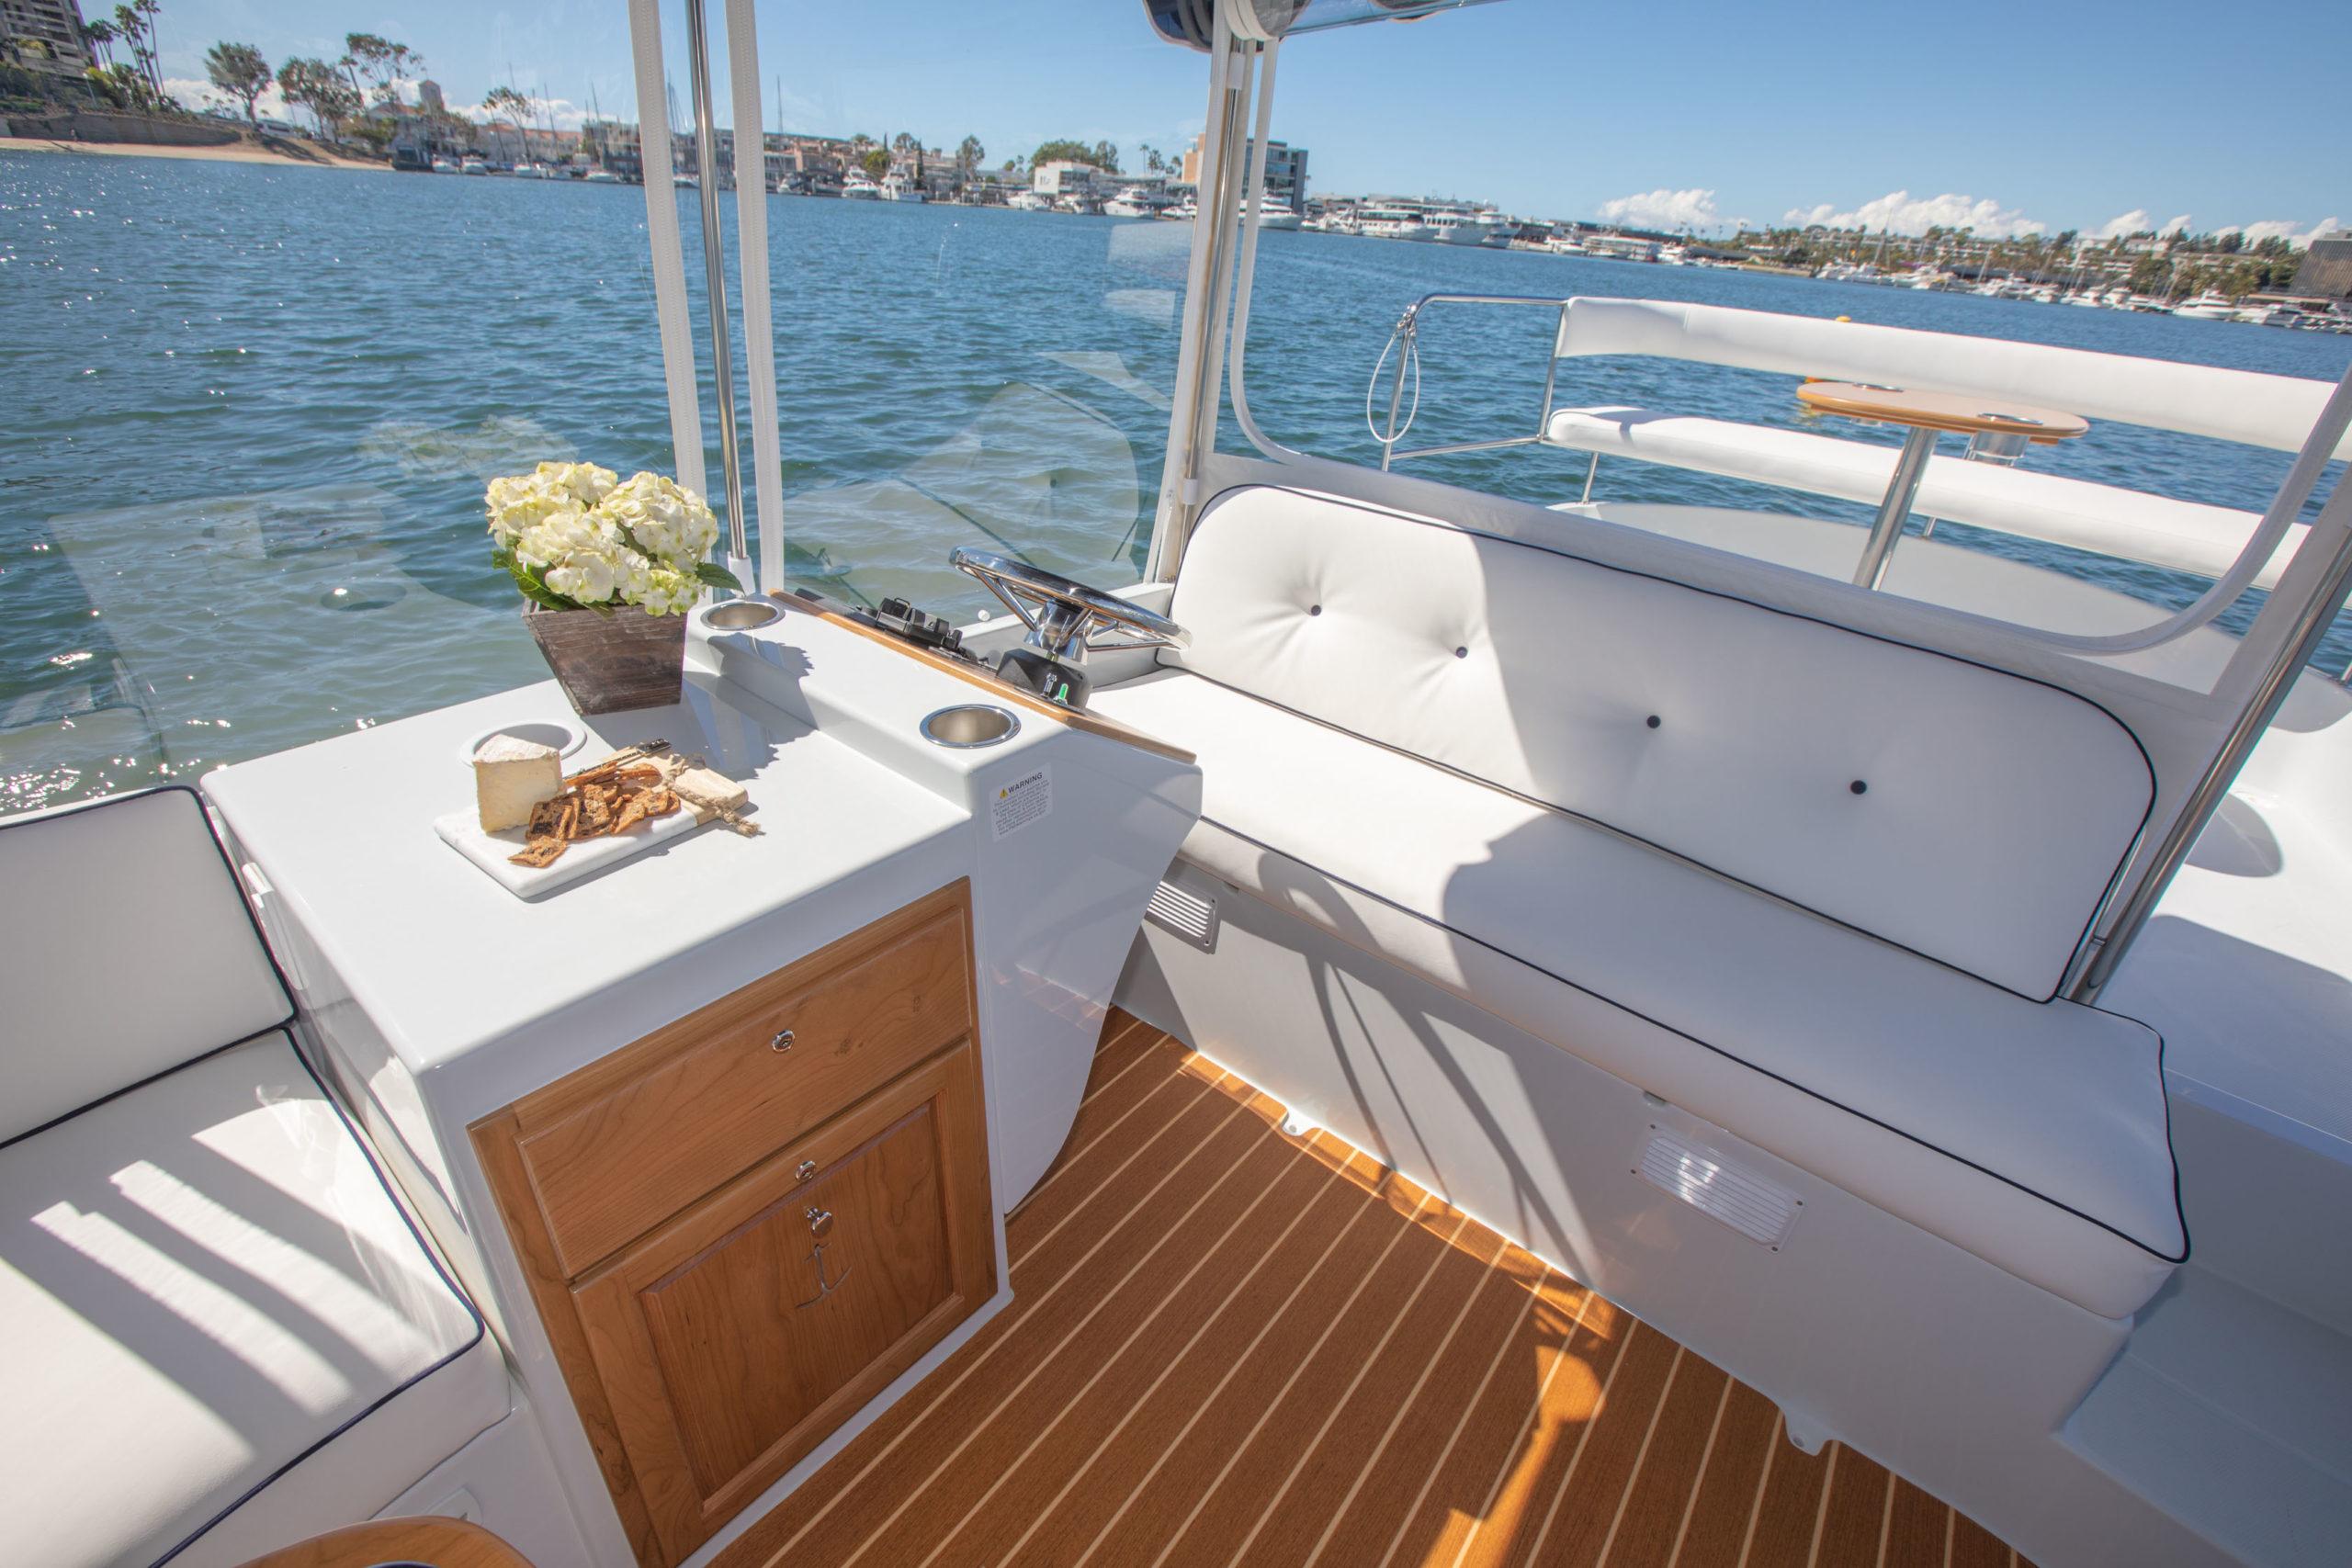 Duffy-Electric-Boats-22-Sun-Cruiser-Interior-2020-12